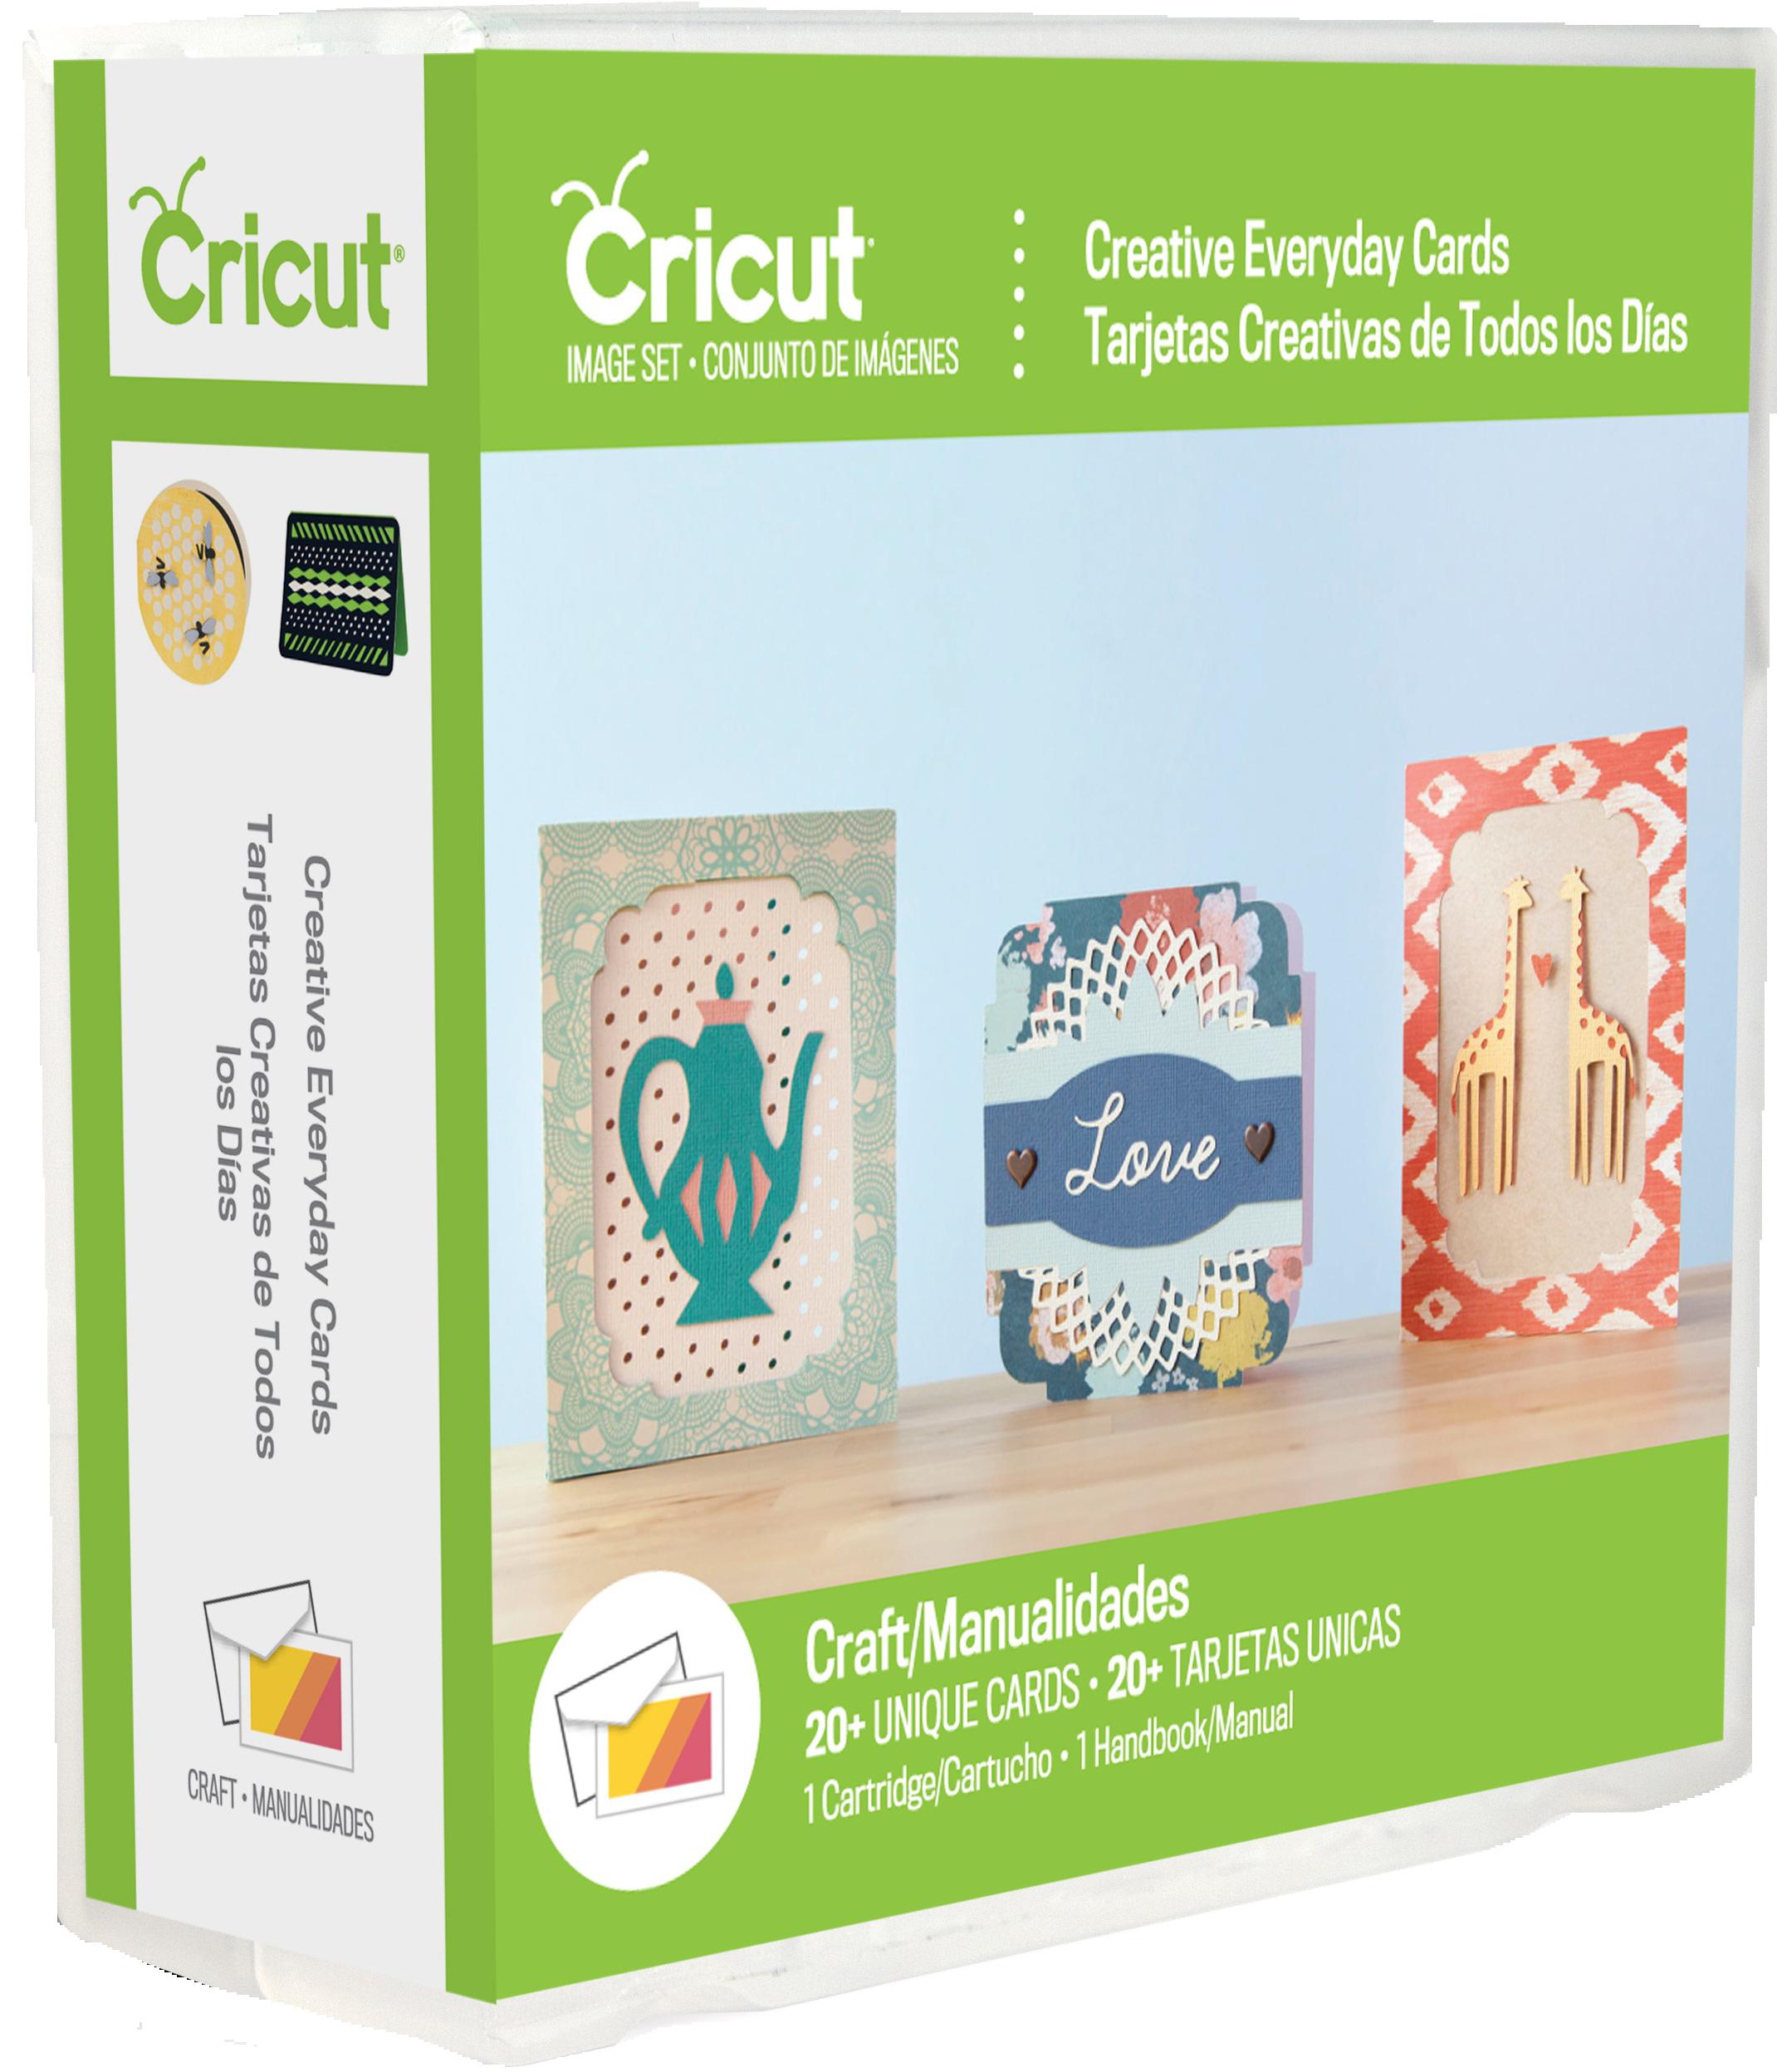 Creative Everyday Cards Cricut Cartridge